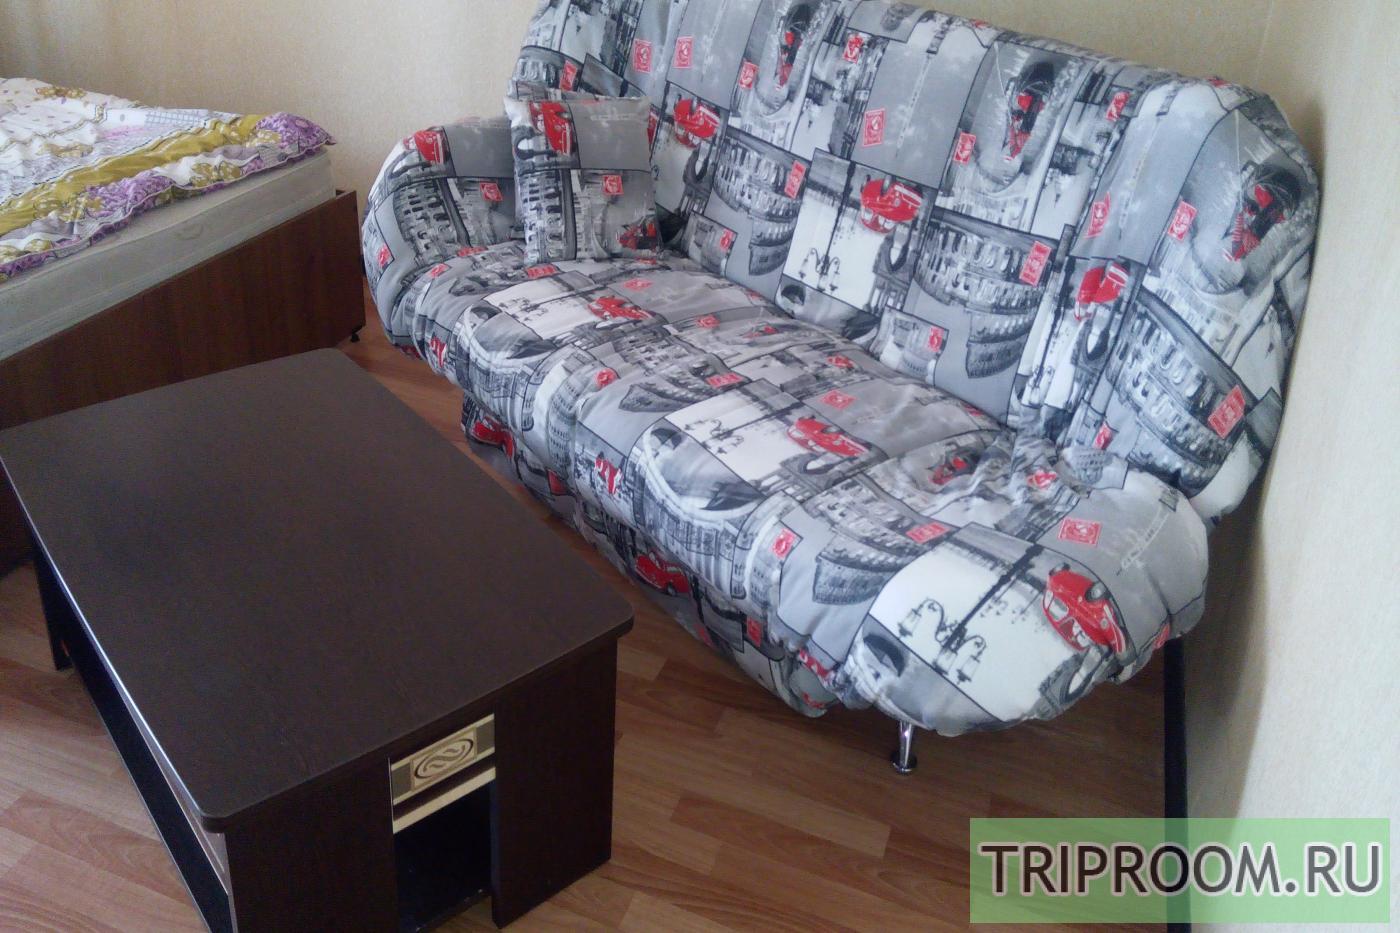 1-комнатная квартира посуточно (вариант № 6662), ул. Алексеева улица, фото № 2